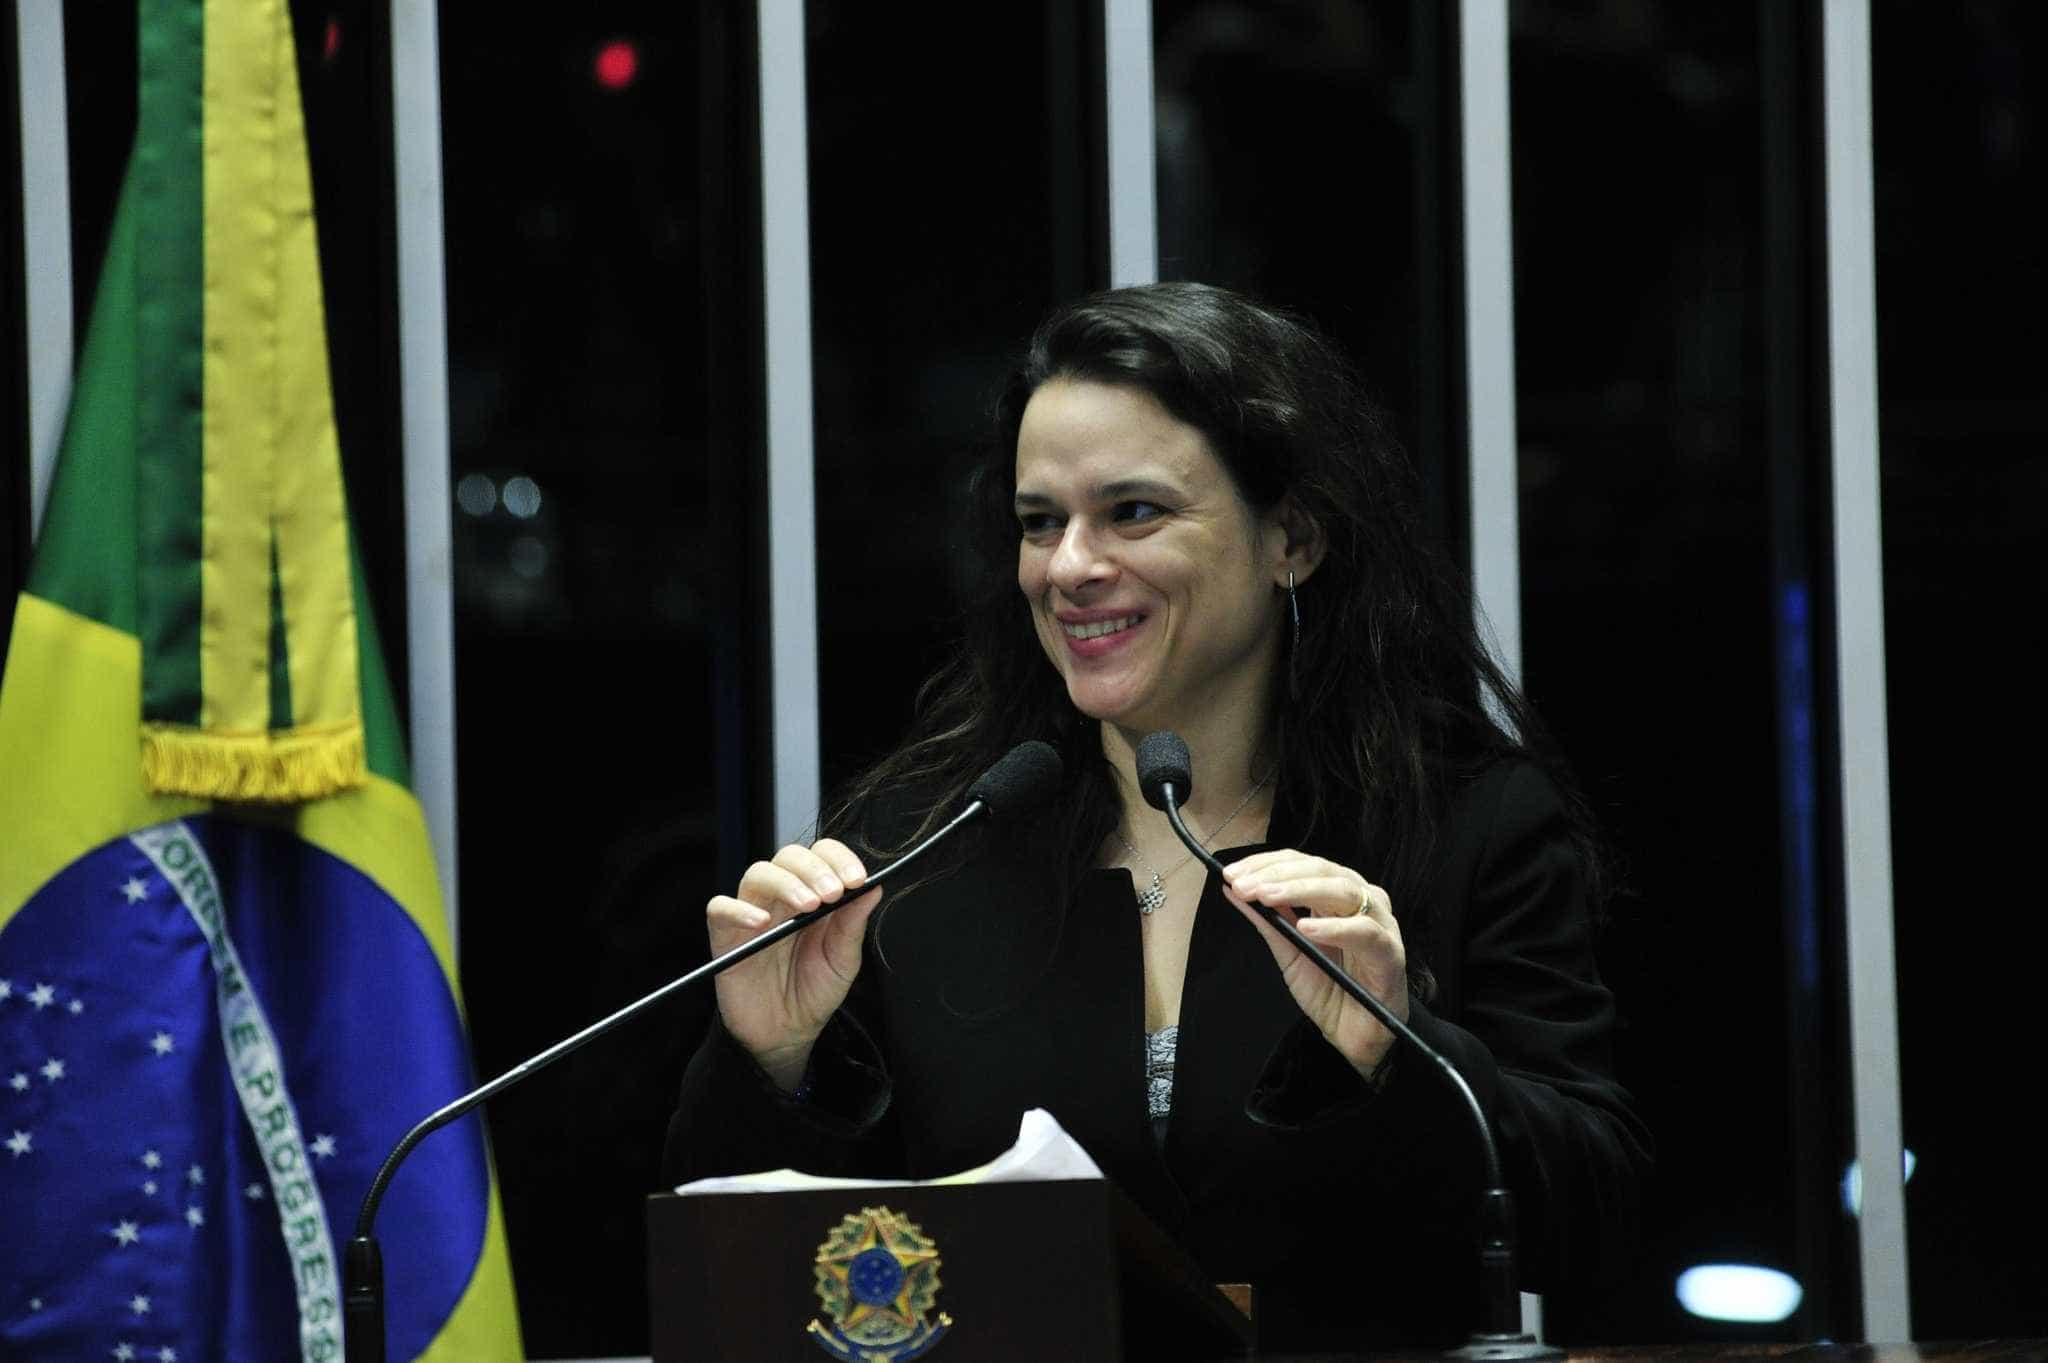 'Se disser que Bolsonaro é misógino, estarei mentindo', diz Janaina